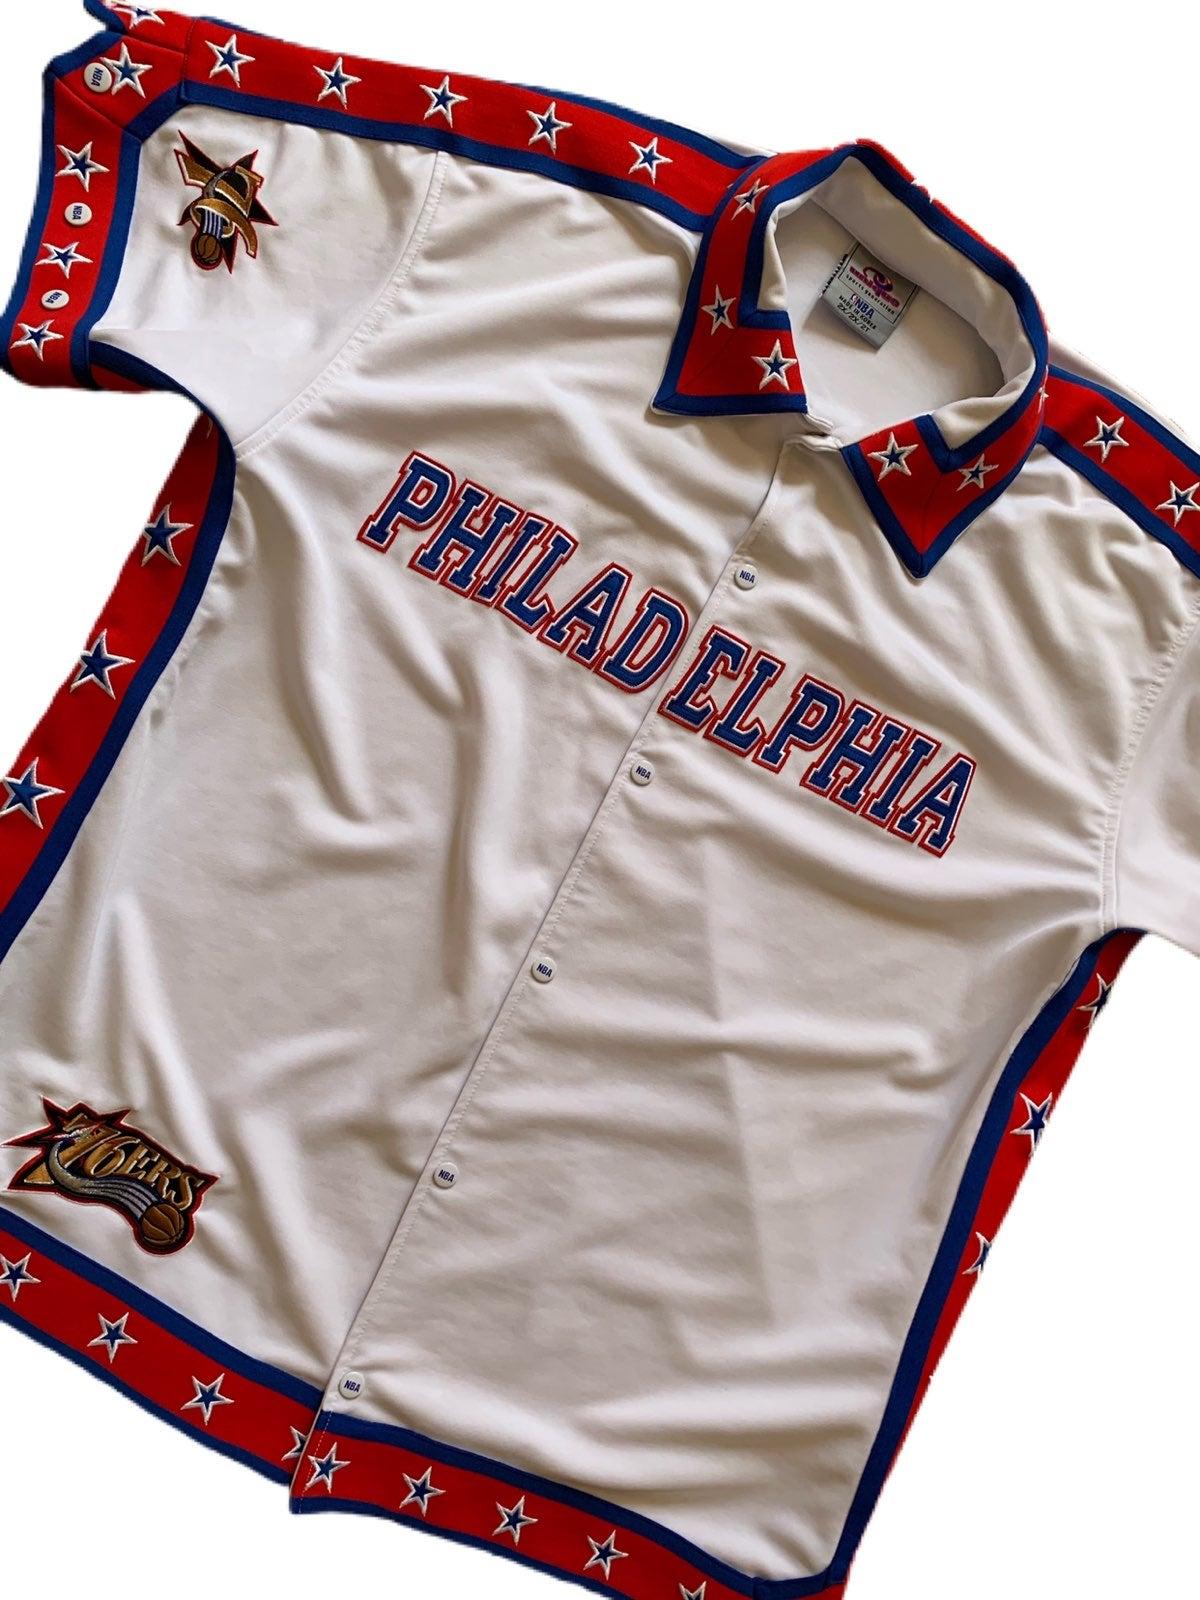 Vintage 90s Philadelphia 76ers Warmup Je